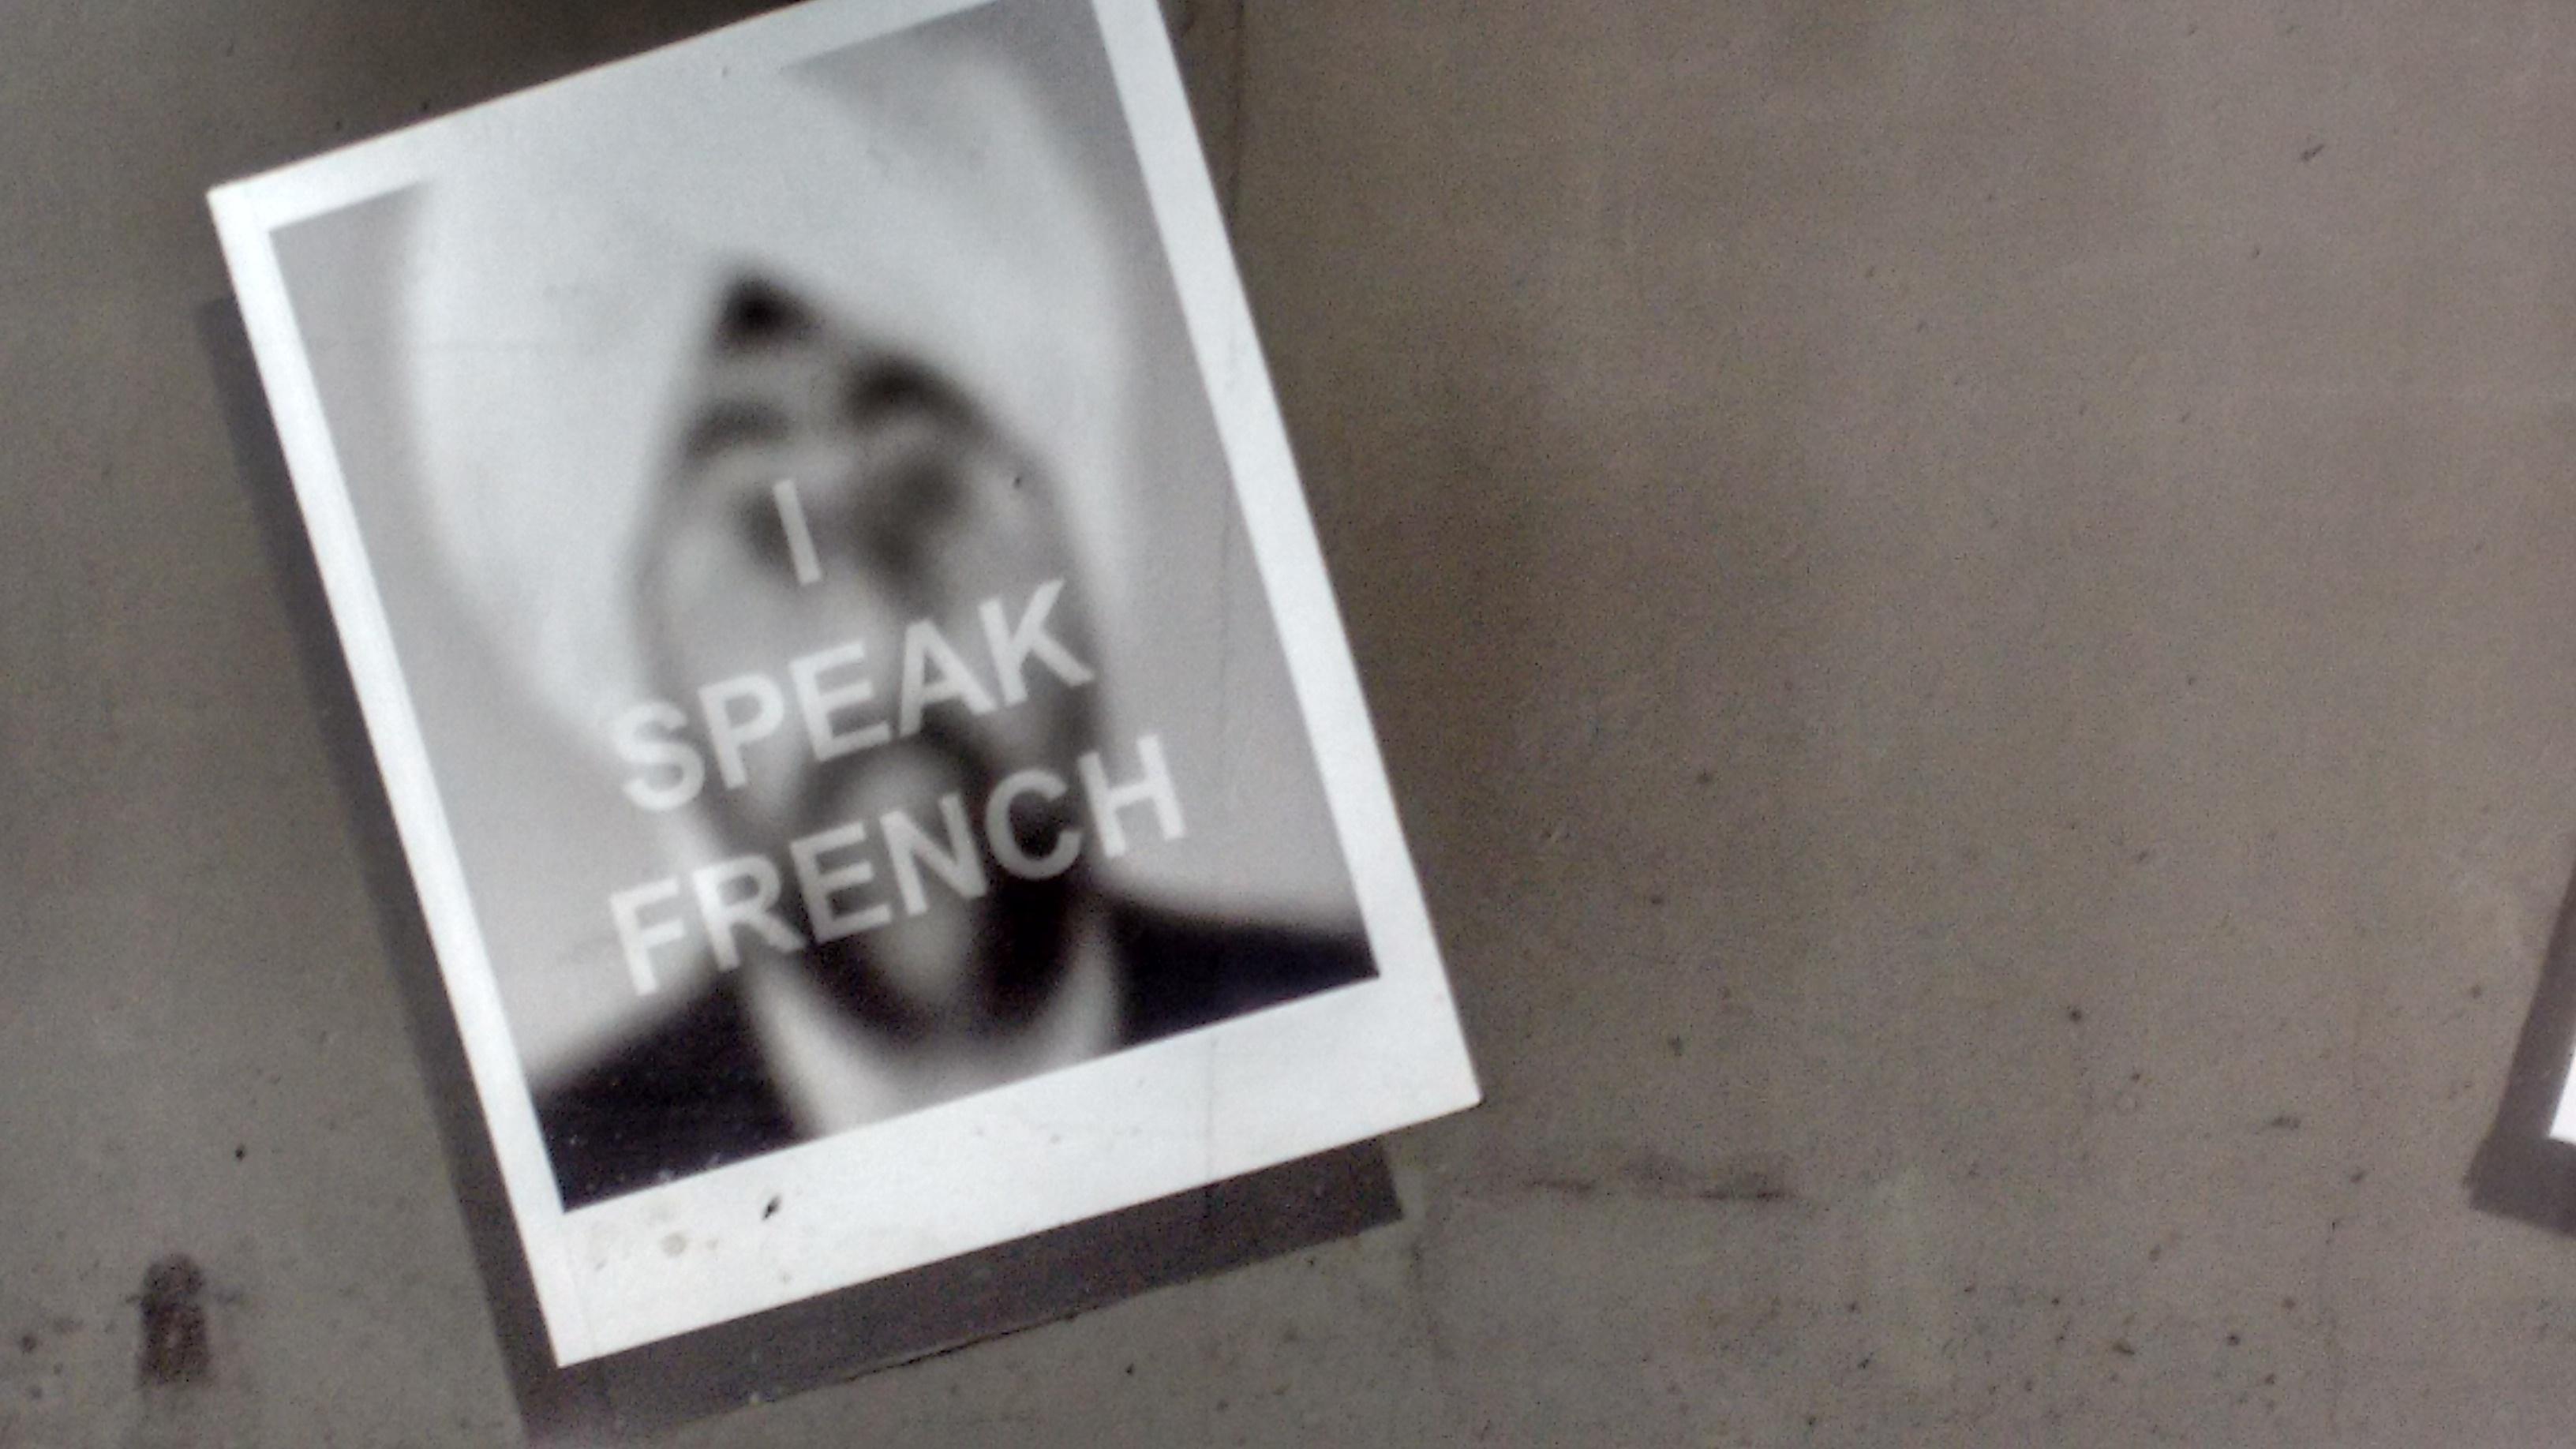 Image: Derek Besant's Public Art Piece/ Kaitlyn Johnson, Calgary Buzz